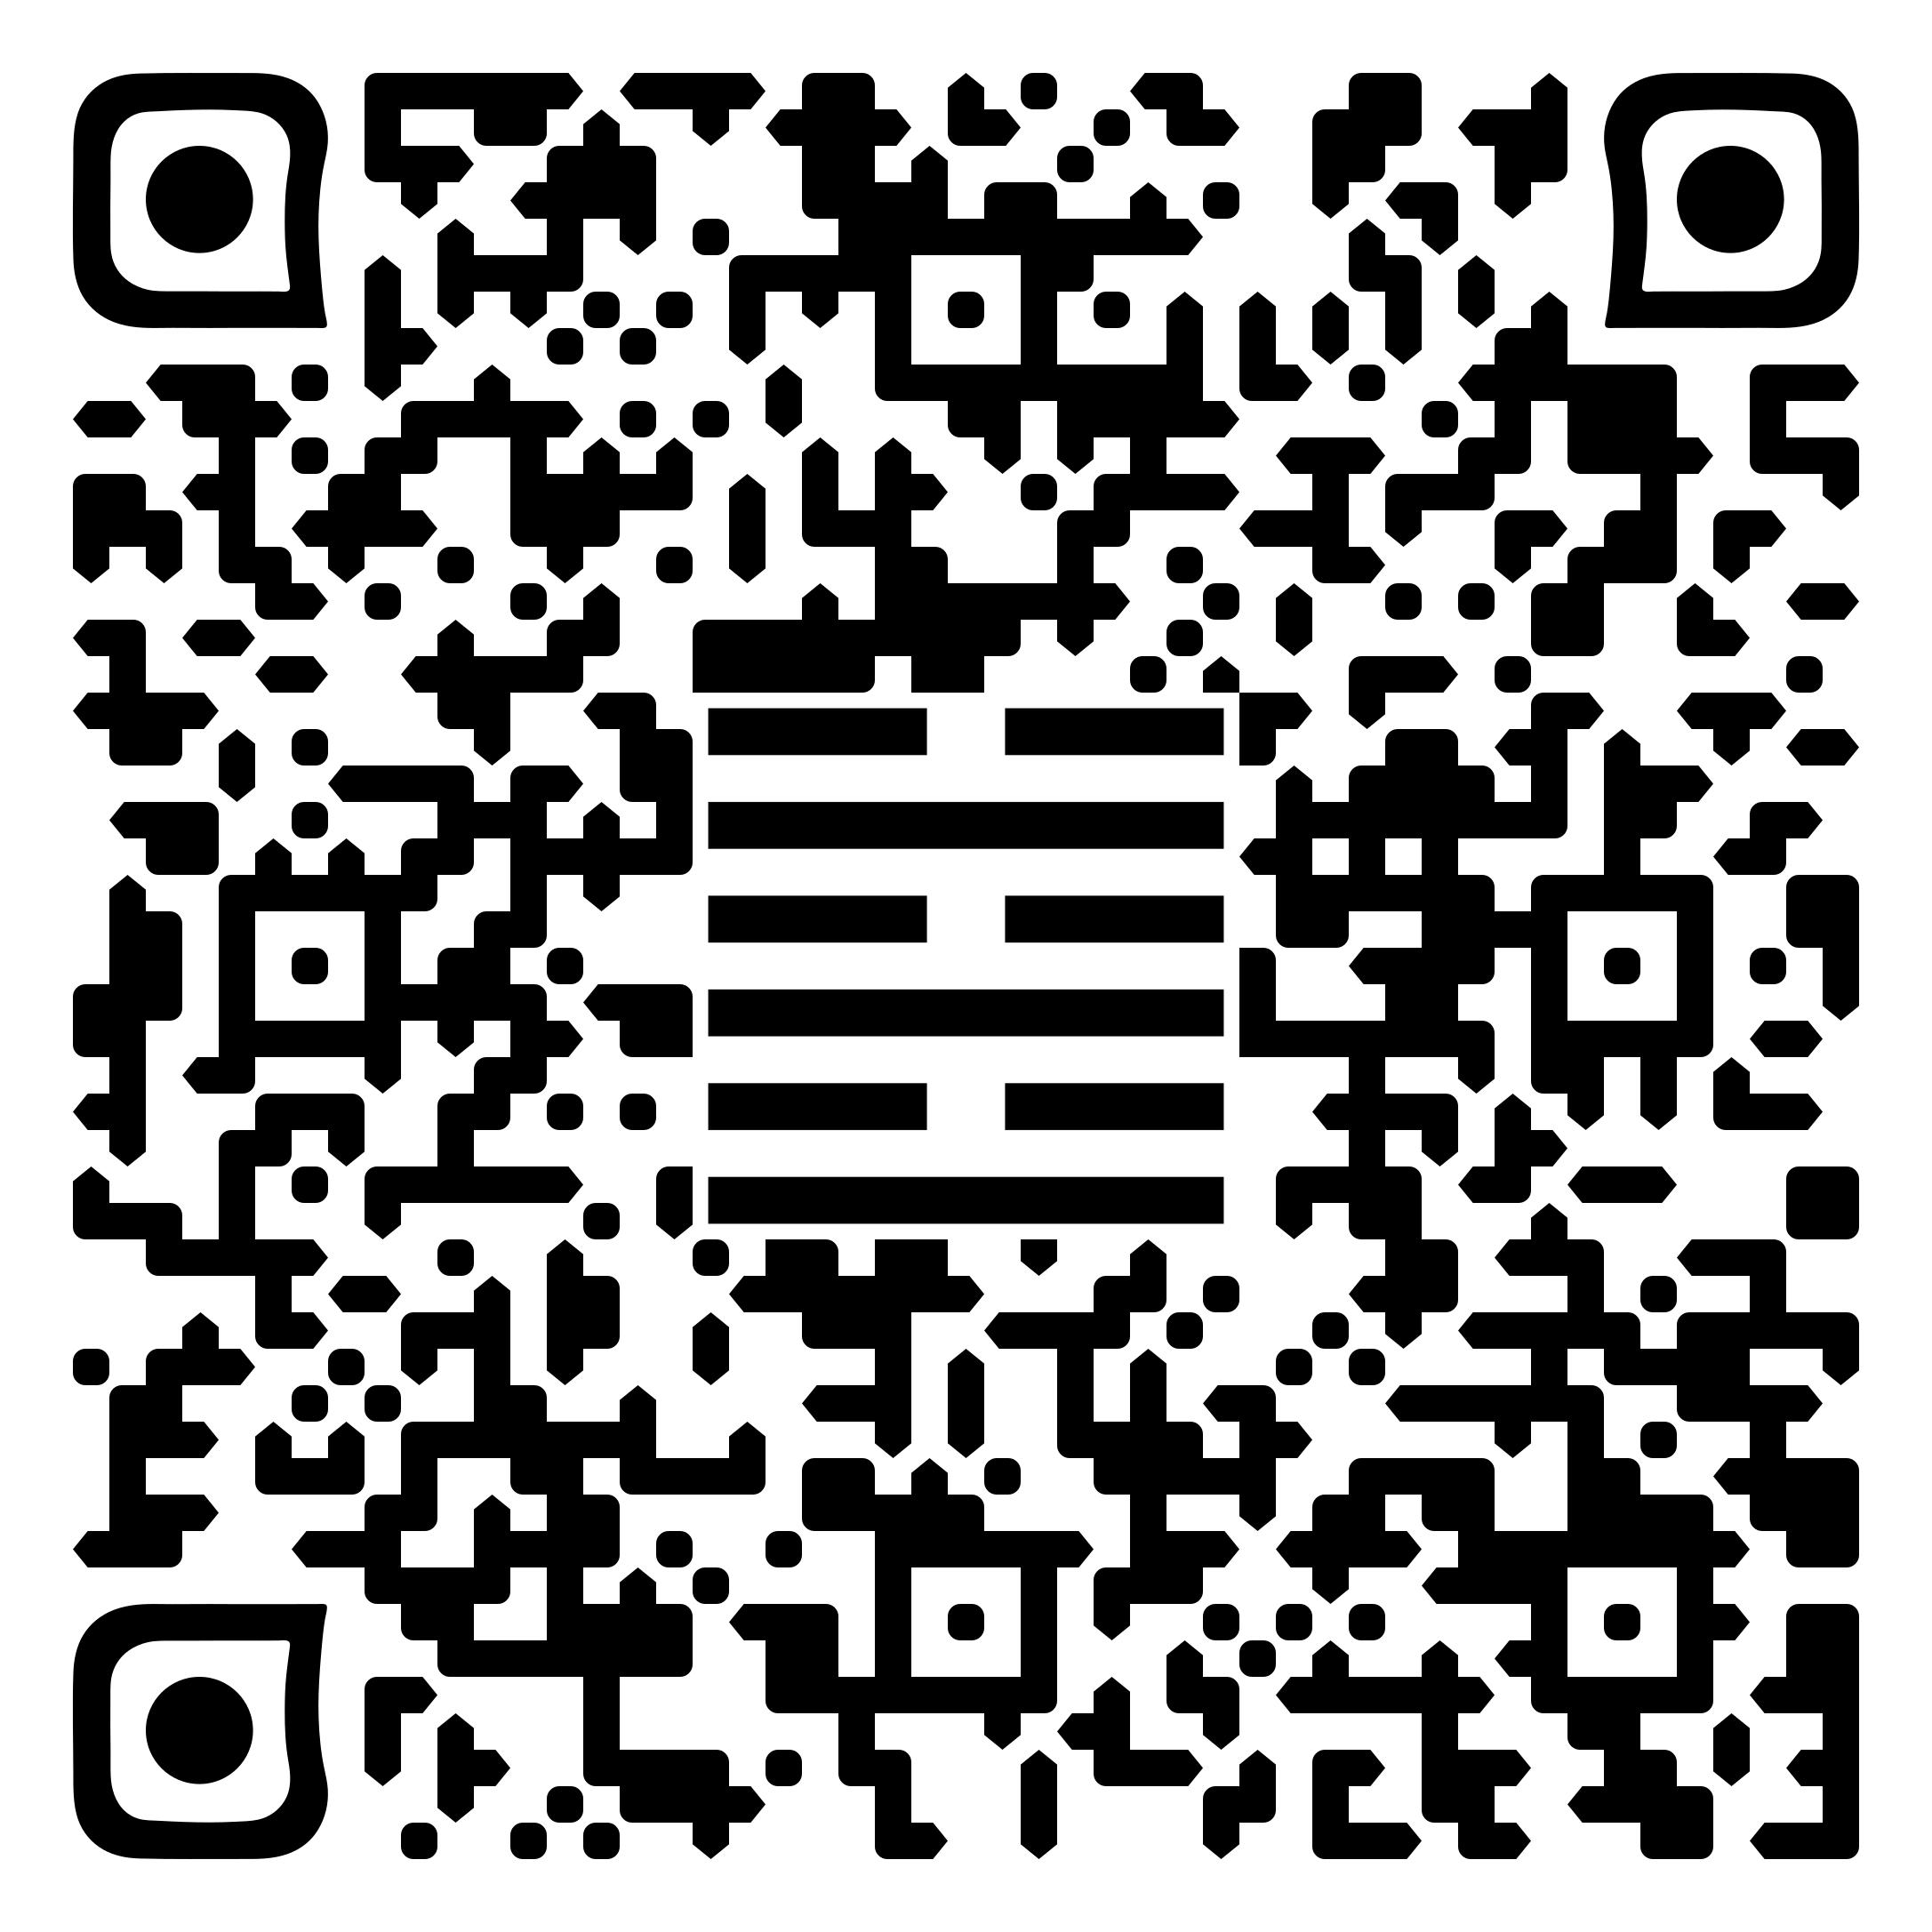 qr-code-63.png